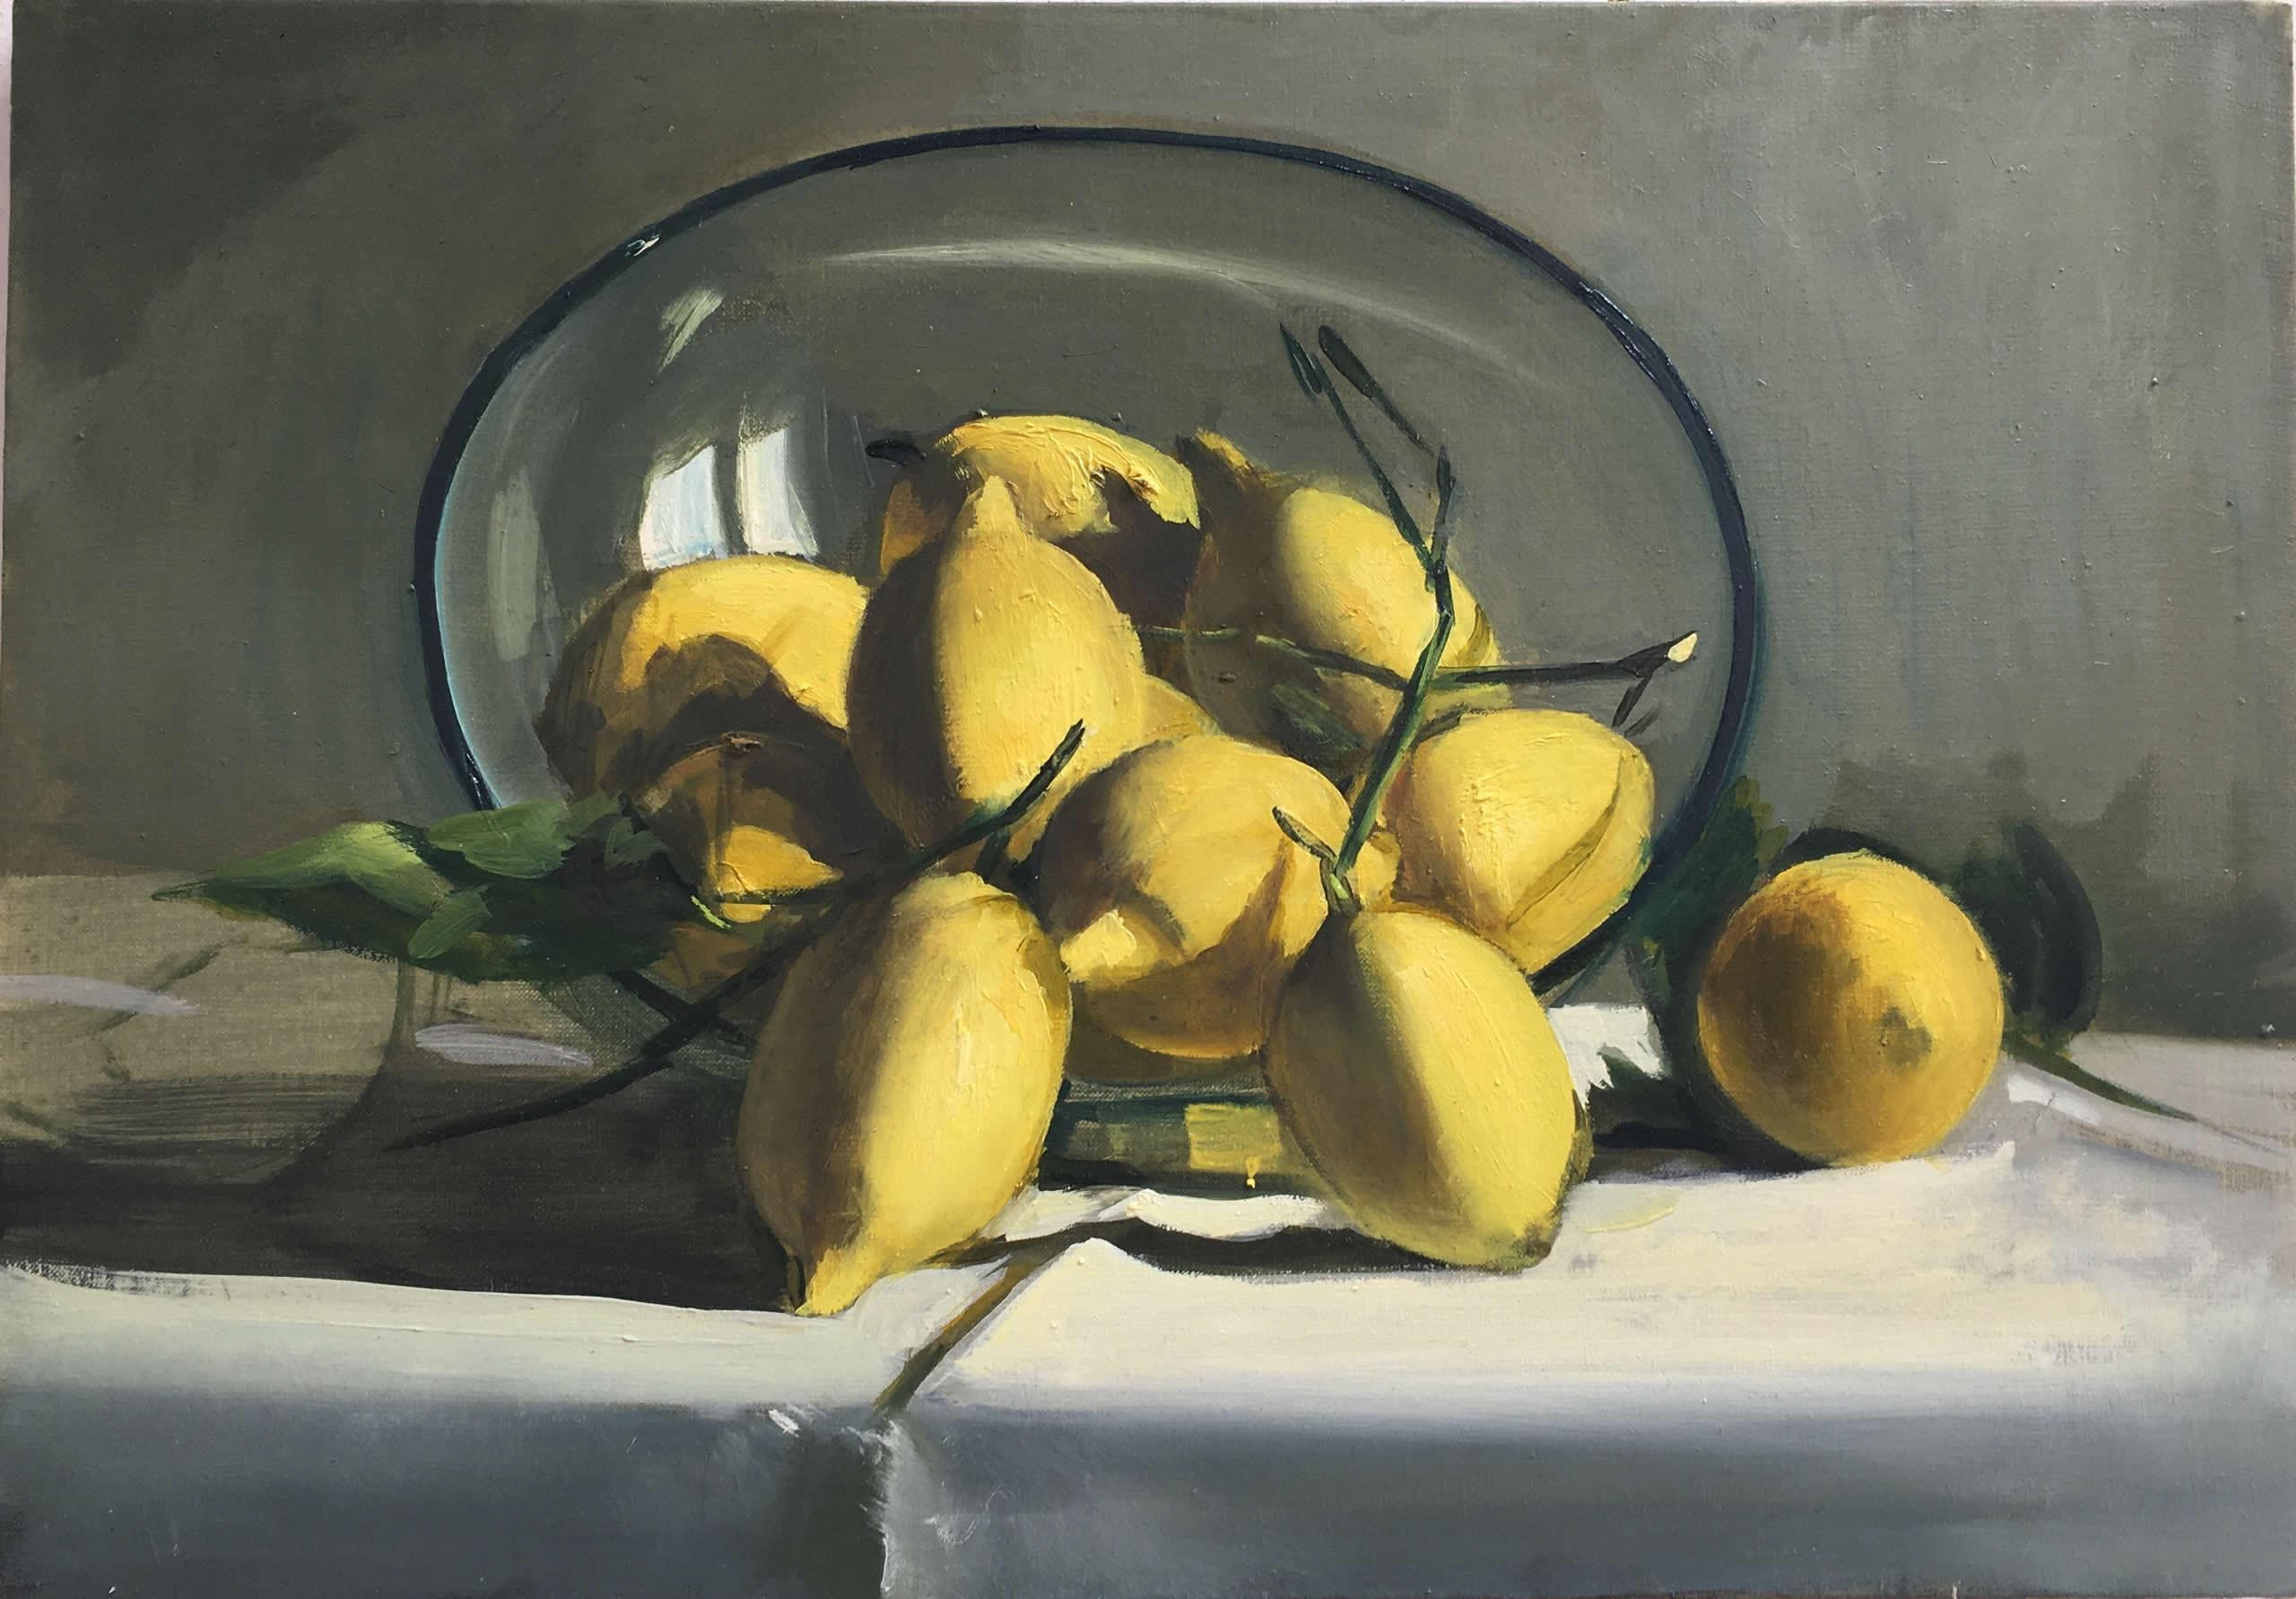 Alex Amann | 2020 | Öl auf Leinwand | 39x58cm | plaisirs simples | Galerie3